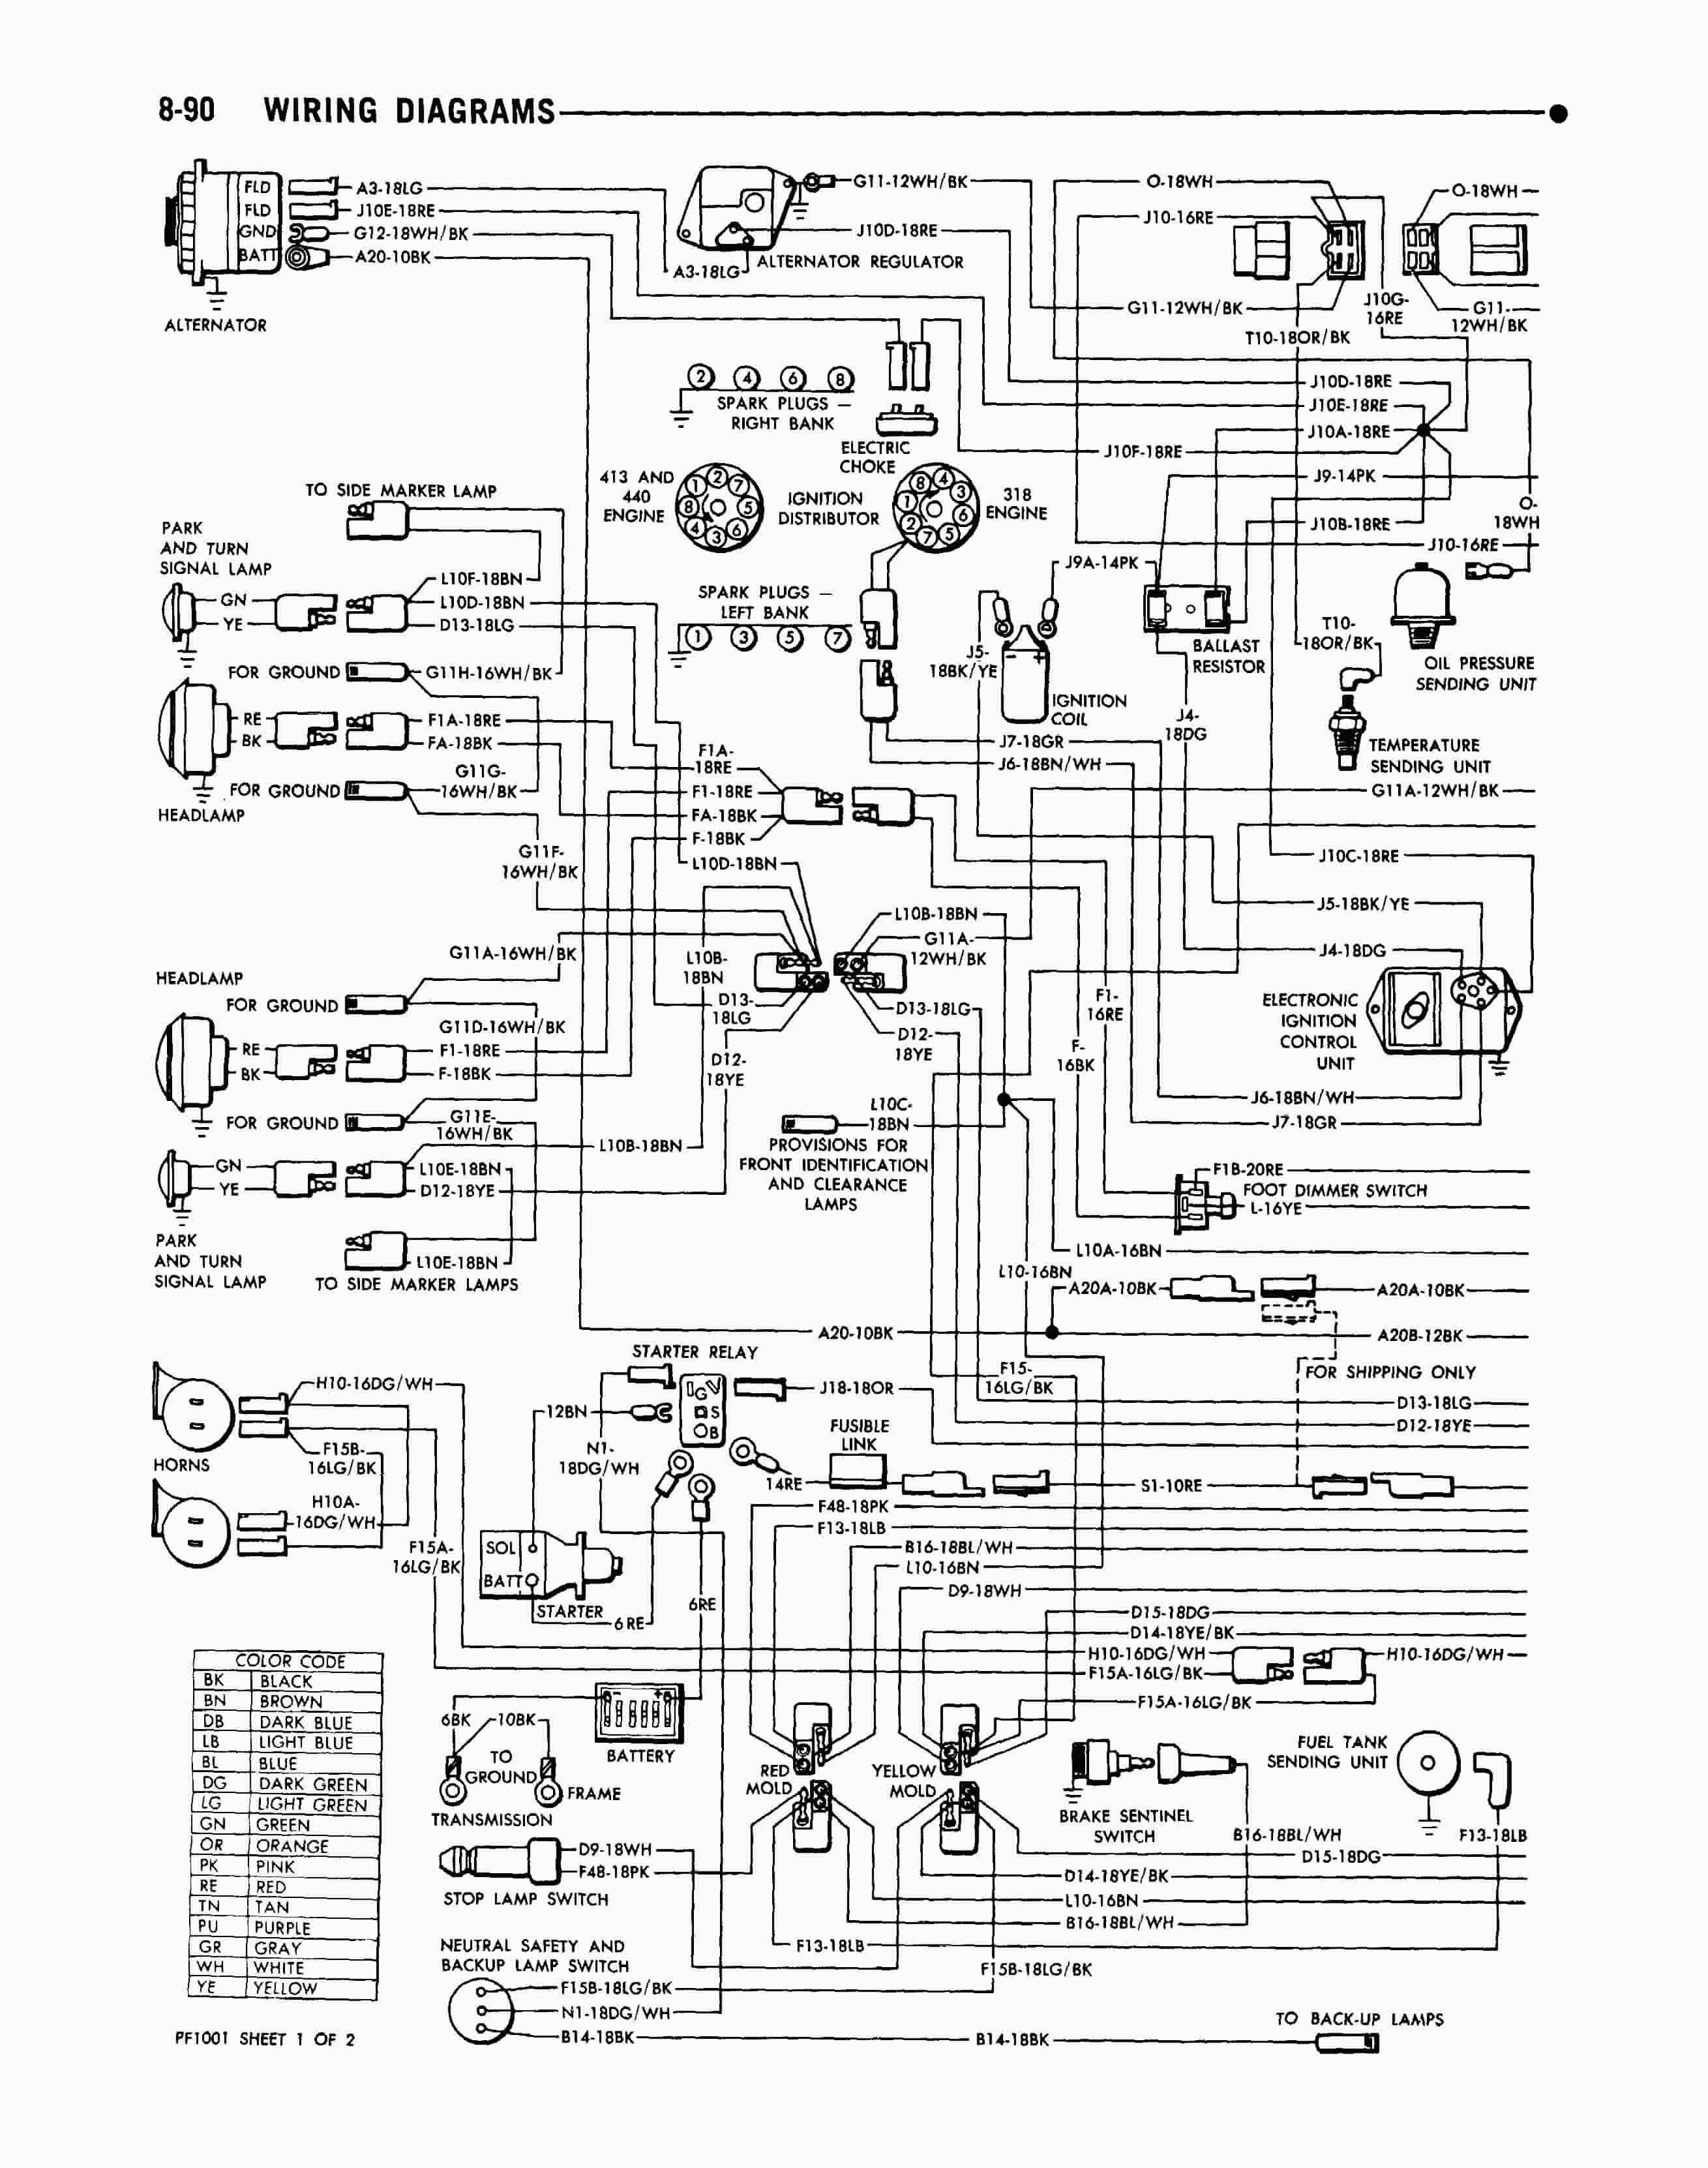 1994 s10 wiper motor wiring diagram 0e82a51 5th wheel camper wiring diagram wiring resources  0e82a51 5th wheel camper wiring diagram